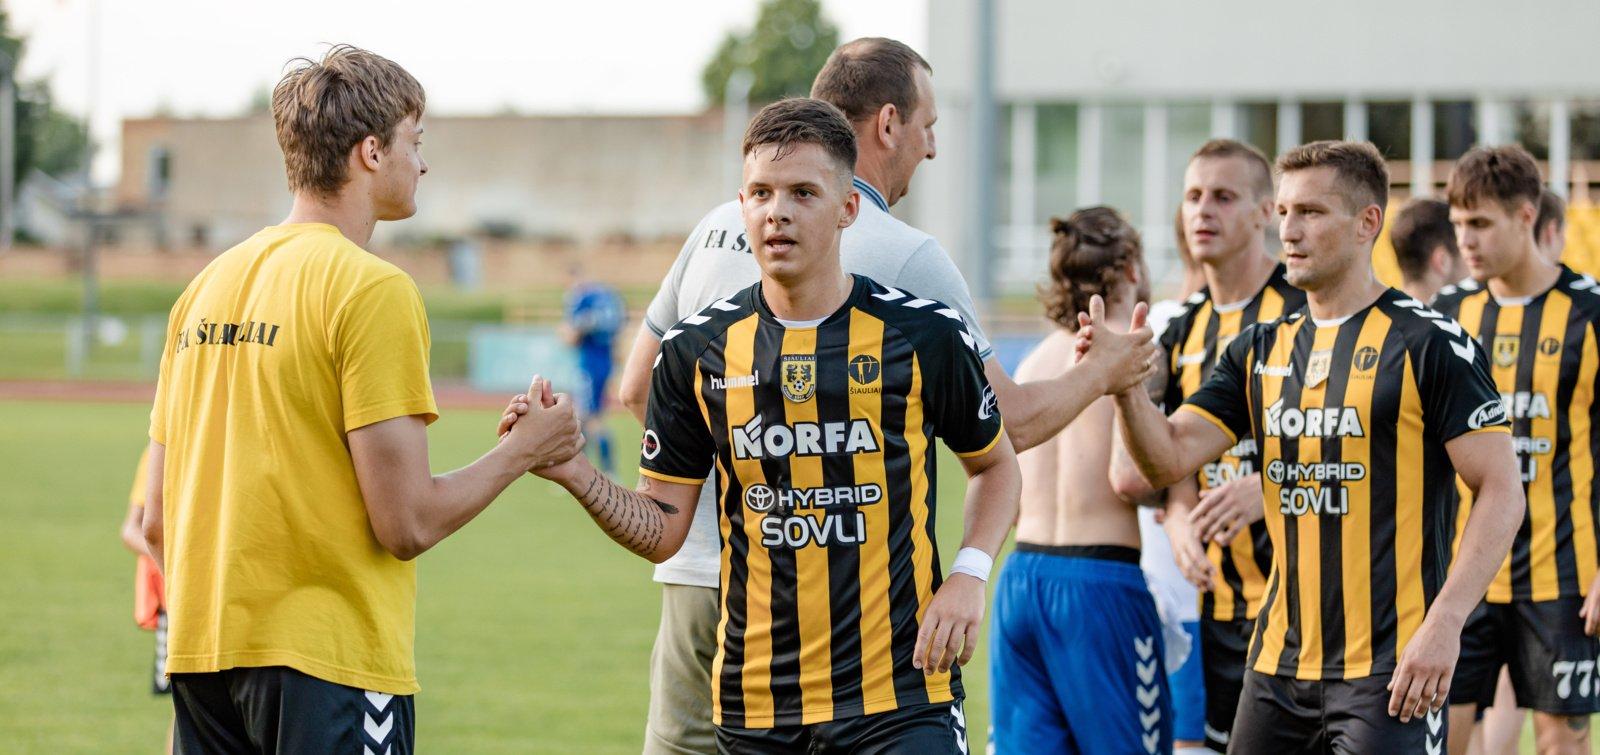 Hegelmann LFF taurės ketvirtfinalio etape - mūšis su žemaičiais